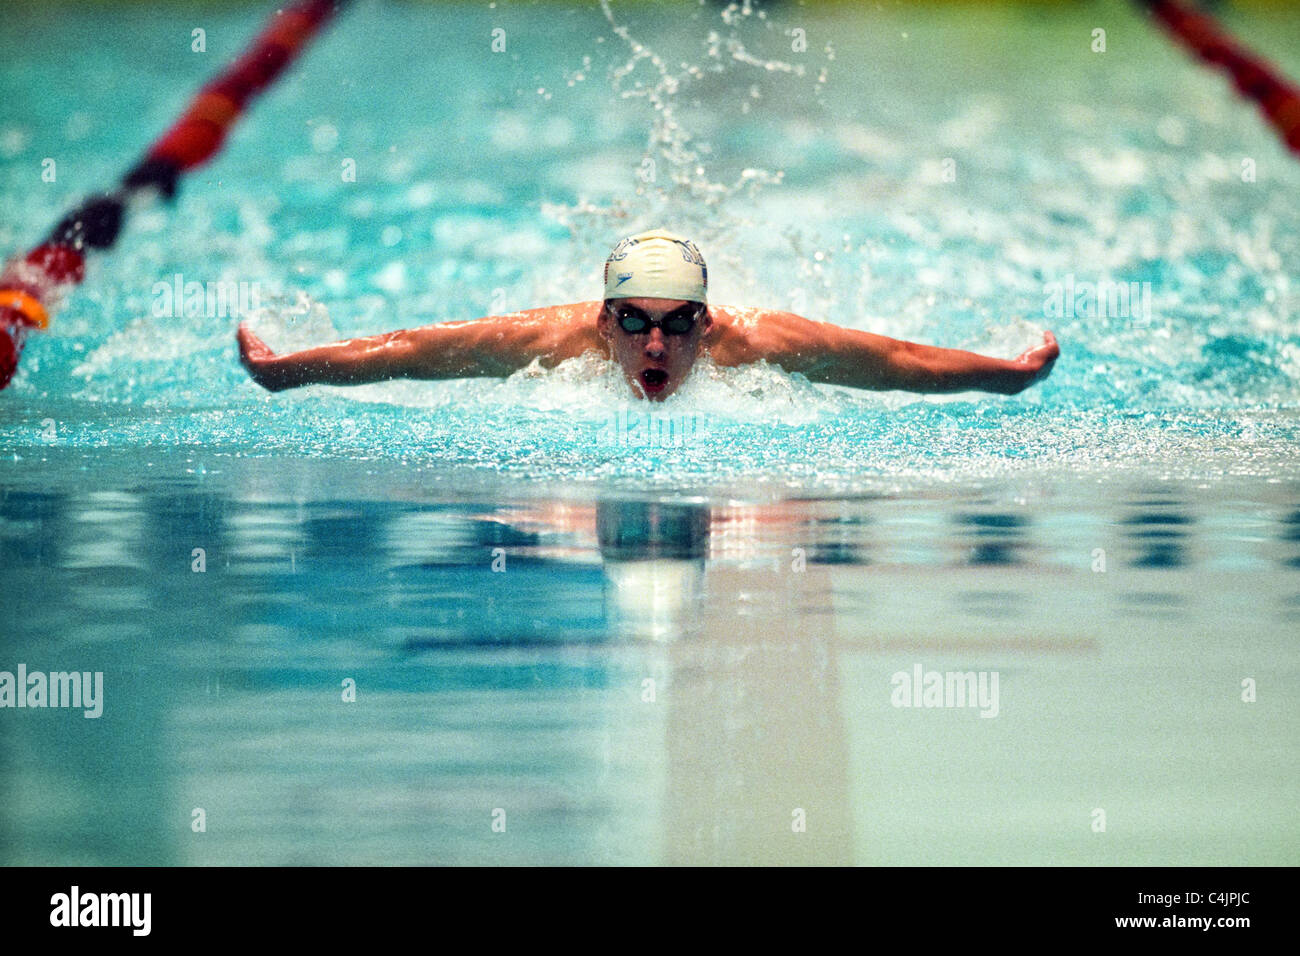 Michael Phelps (USA), 15 ans, à l'USA 2000 ressortissants de printemps. Photo Stock